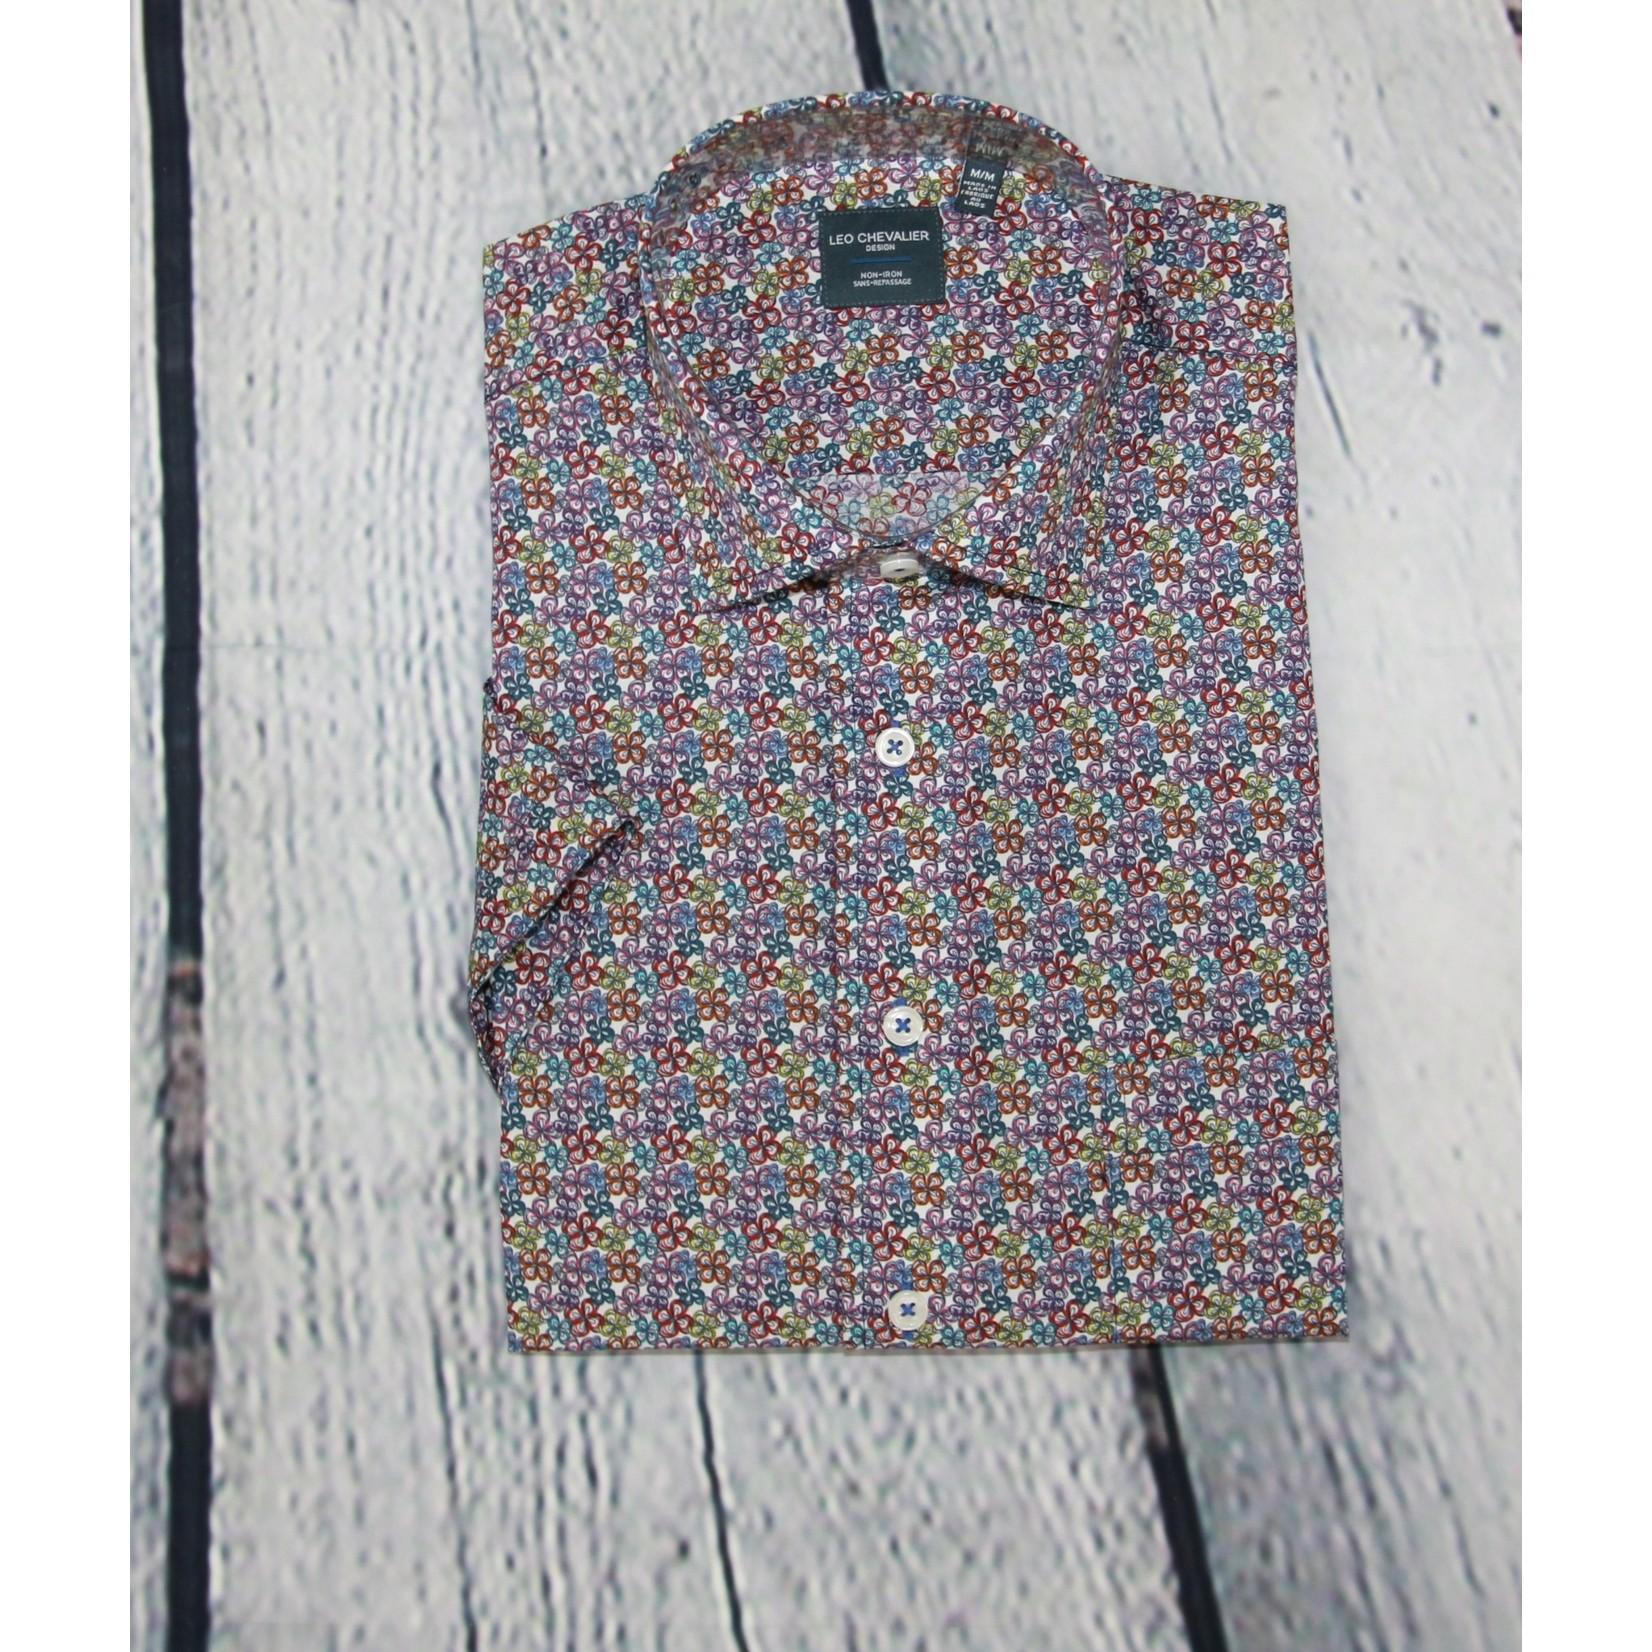 Leo Chevalier Collared Shirt